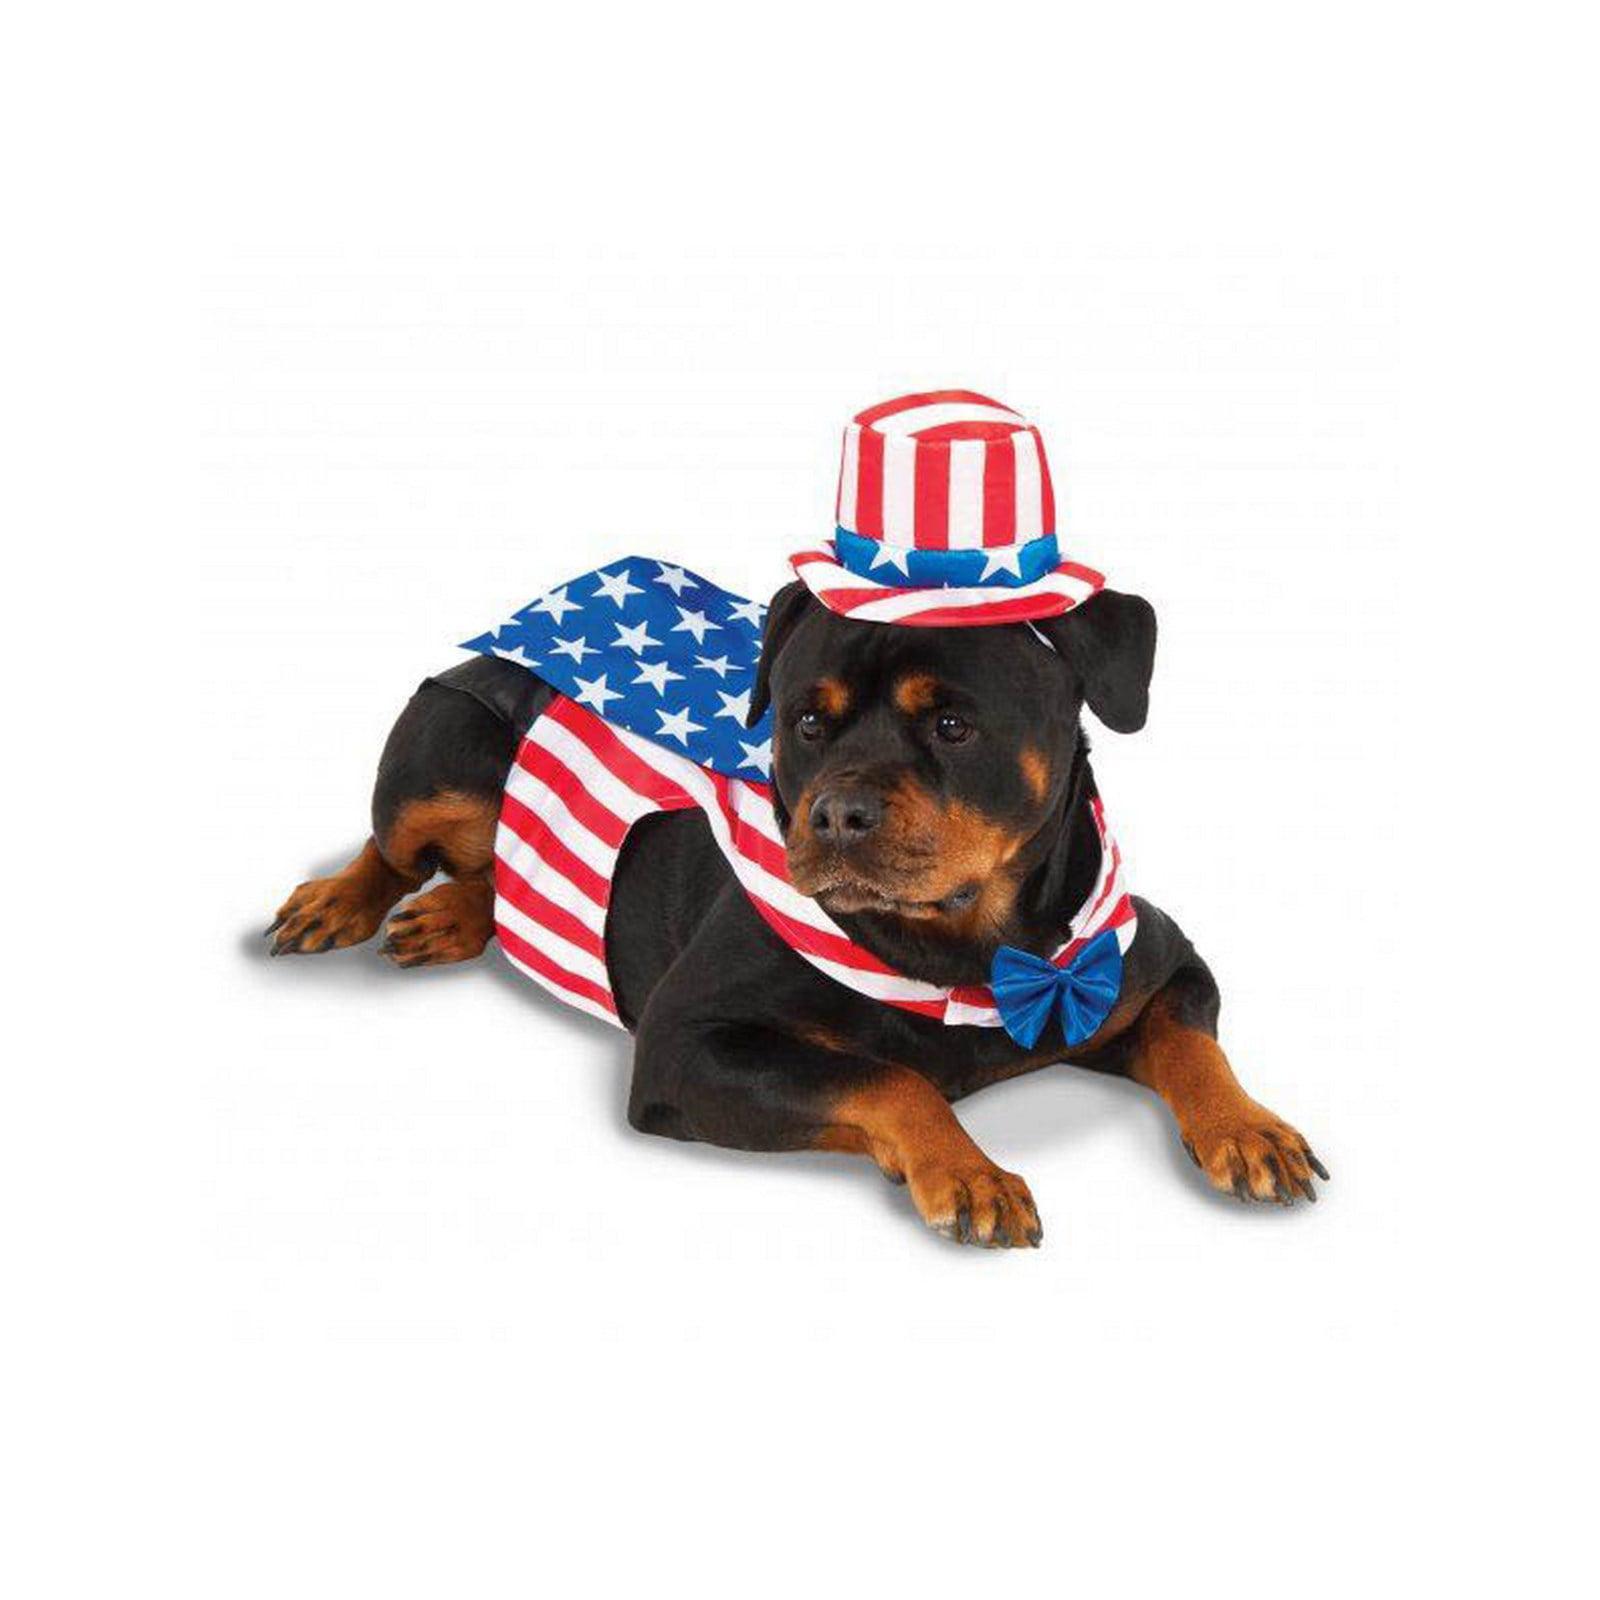 Uncle Sam - Big Dogs' Pet Costume